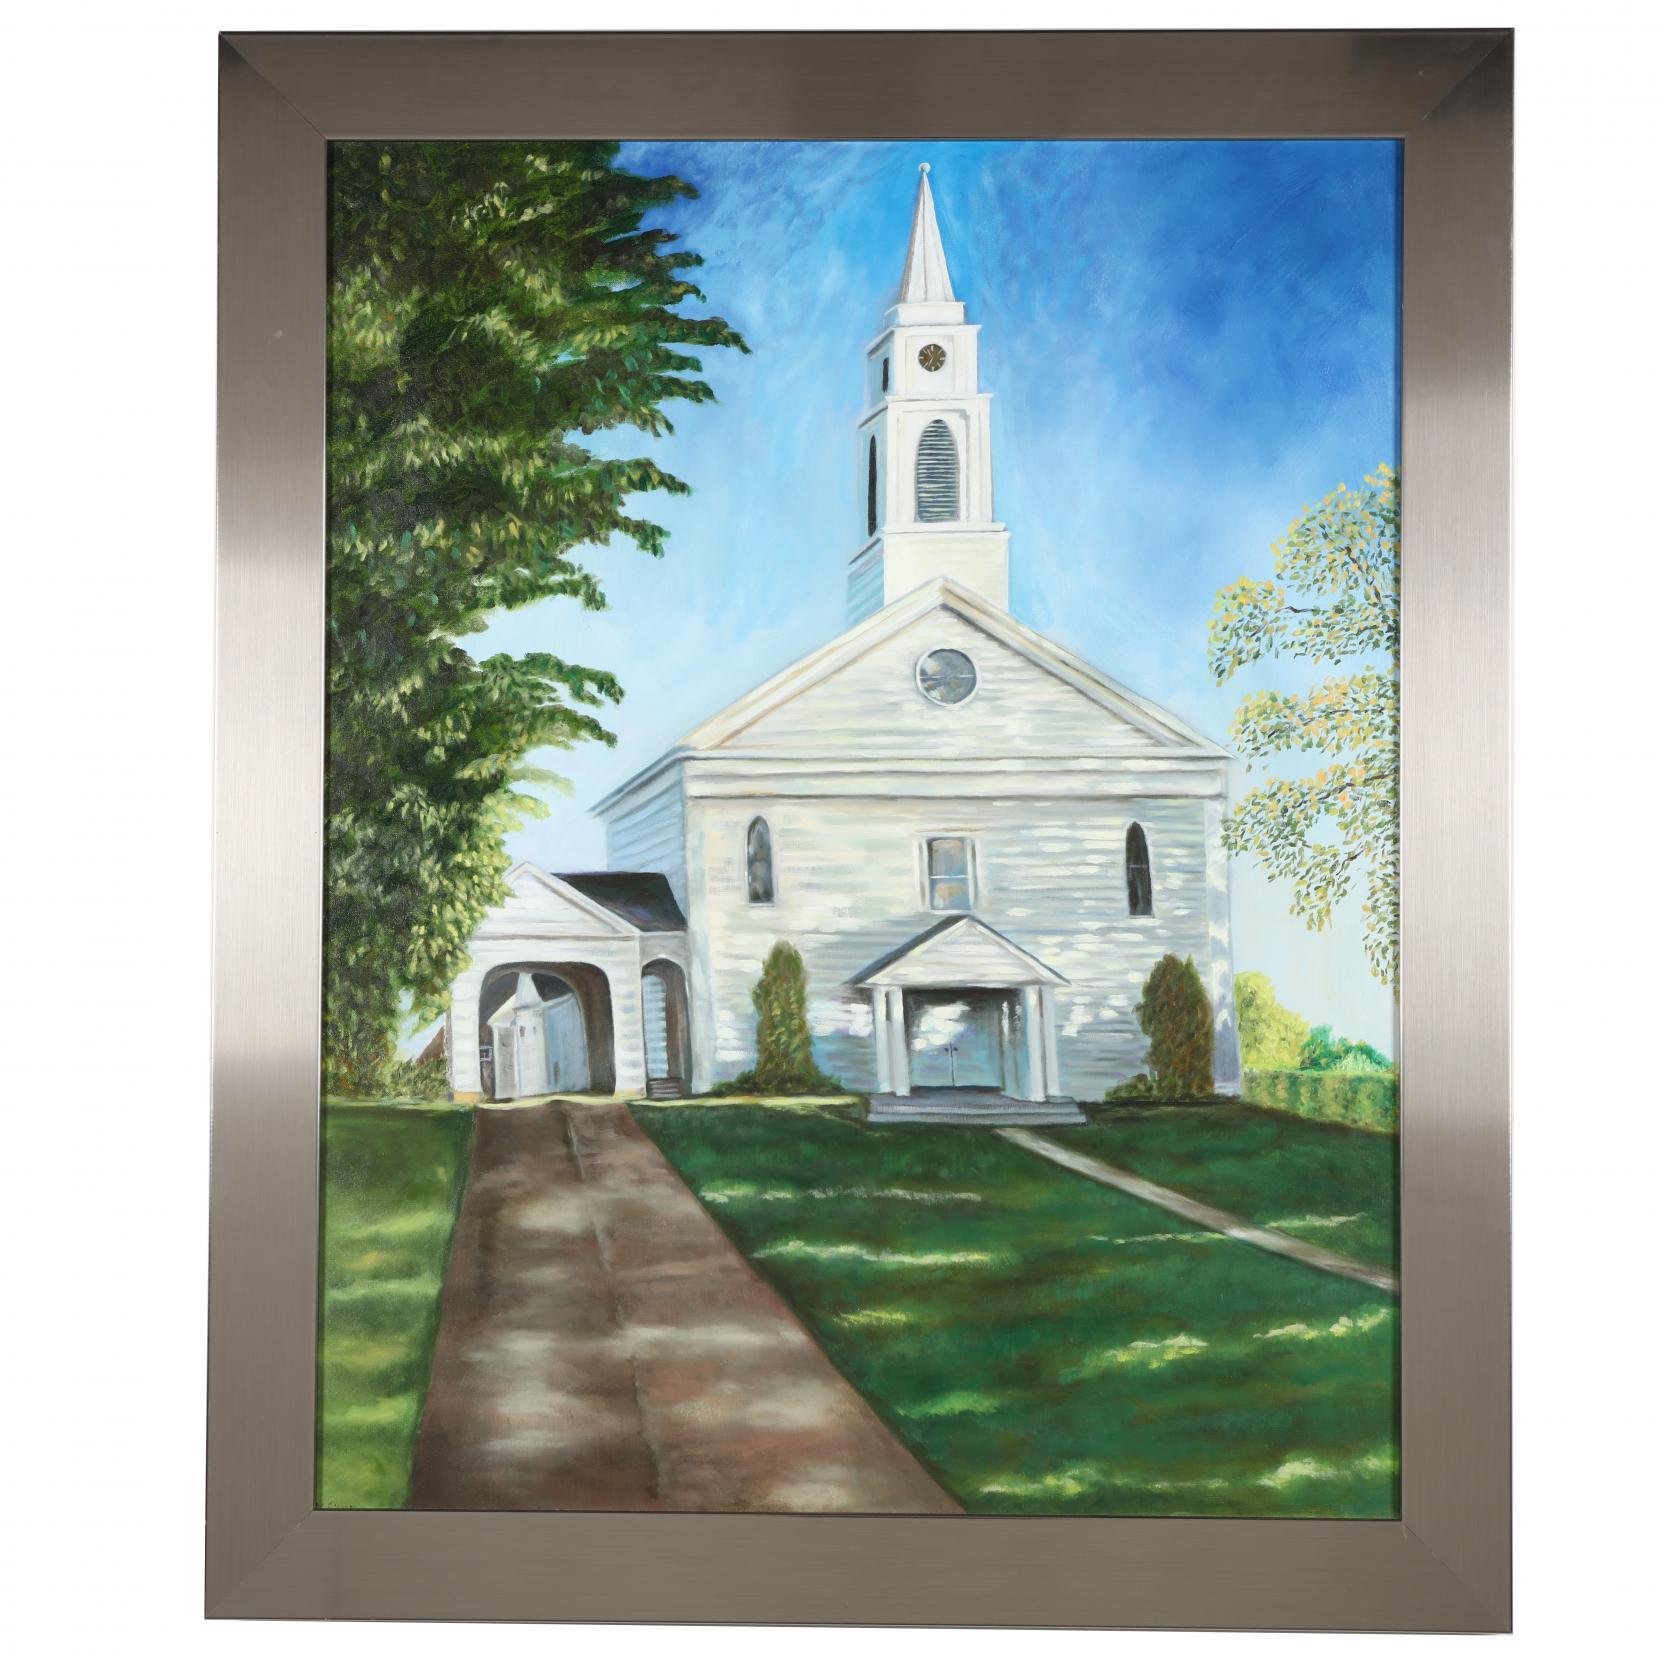 mark-simon-20th-century-framed-painting-of-a-church-with-steeple